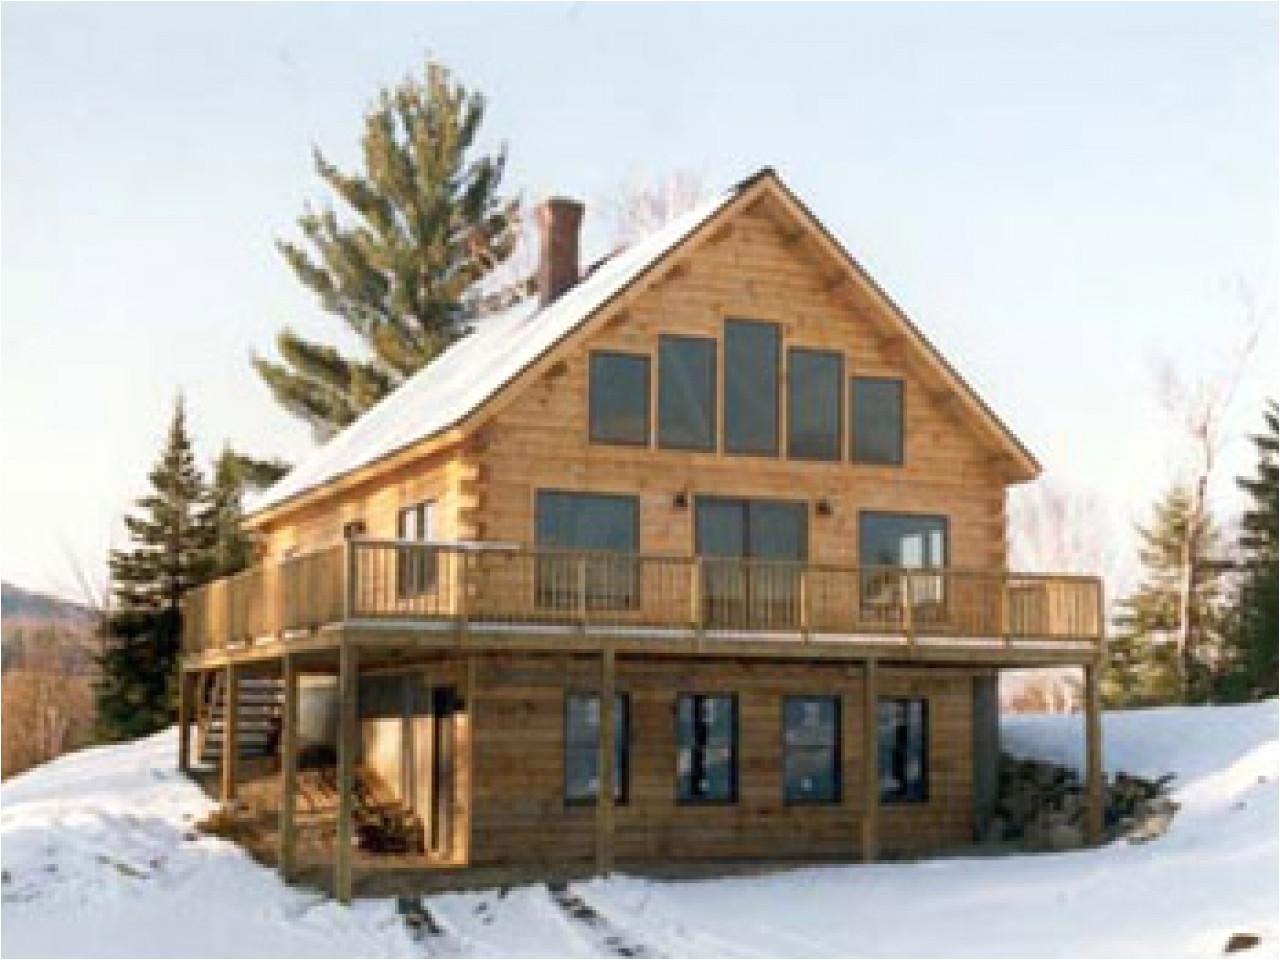 8f97018a8542ba50 chalet modular home floor plans chalet style modular home plans